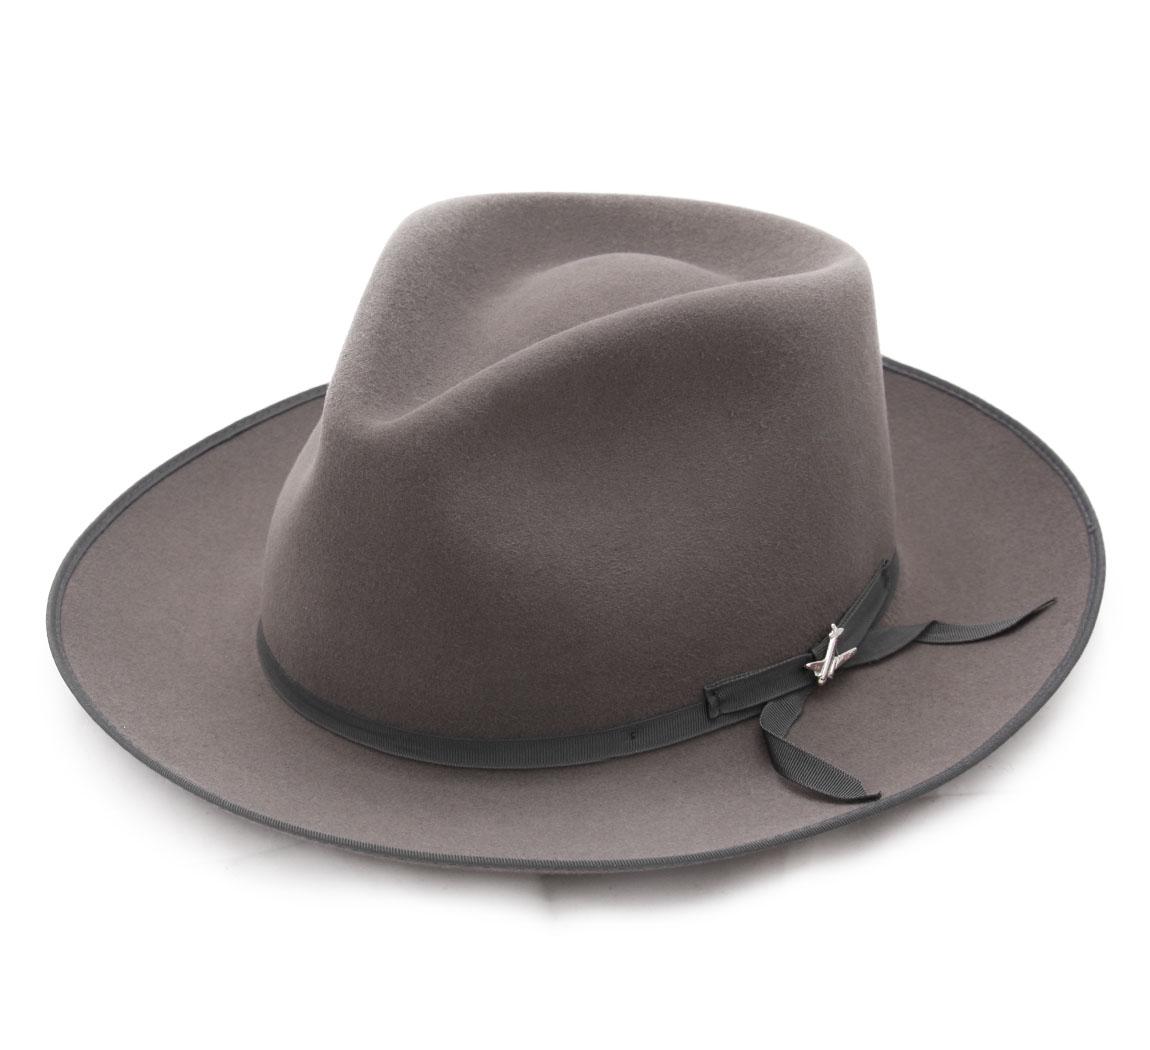 b4e232a2a9249 Stratoliner Fur Felt - Hats Stetson